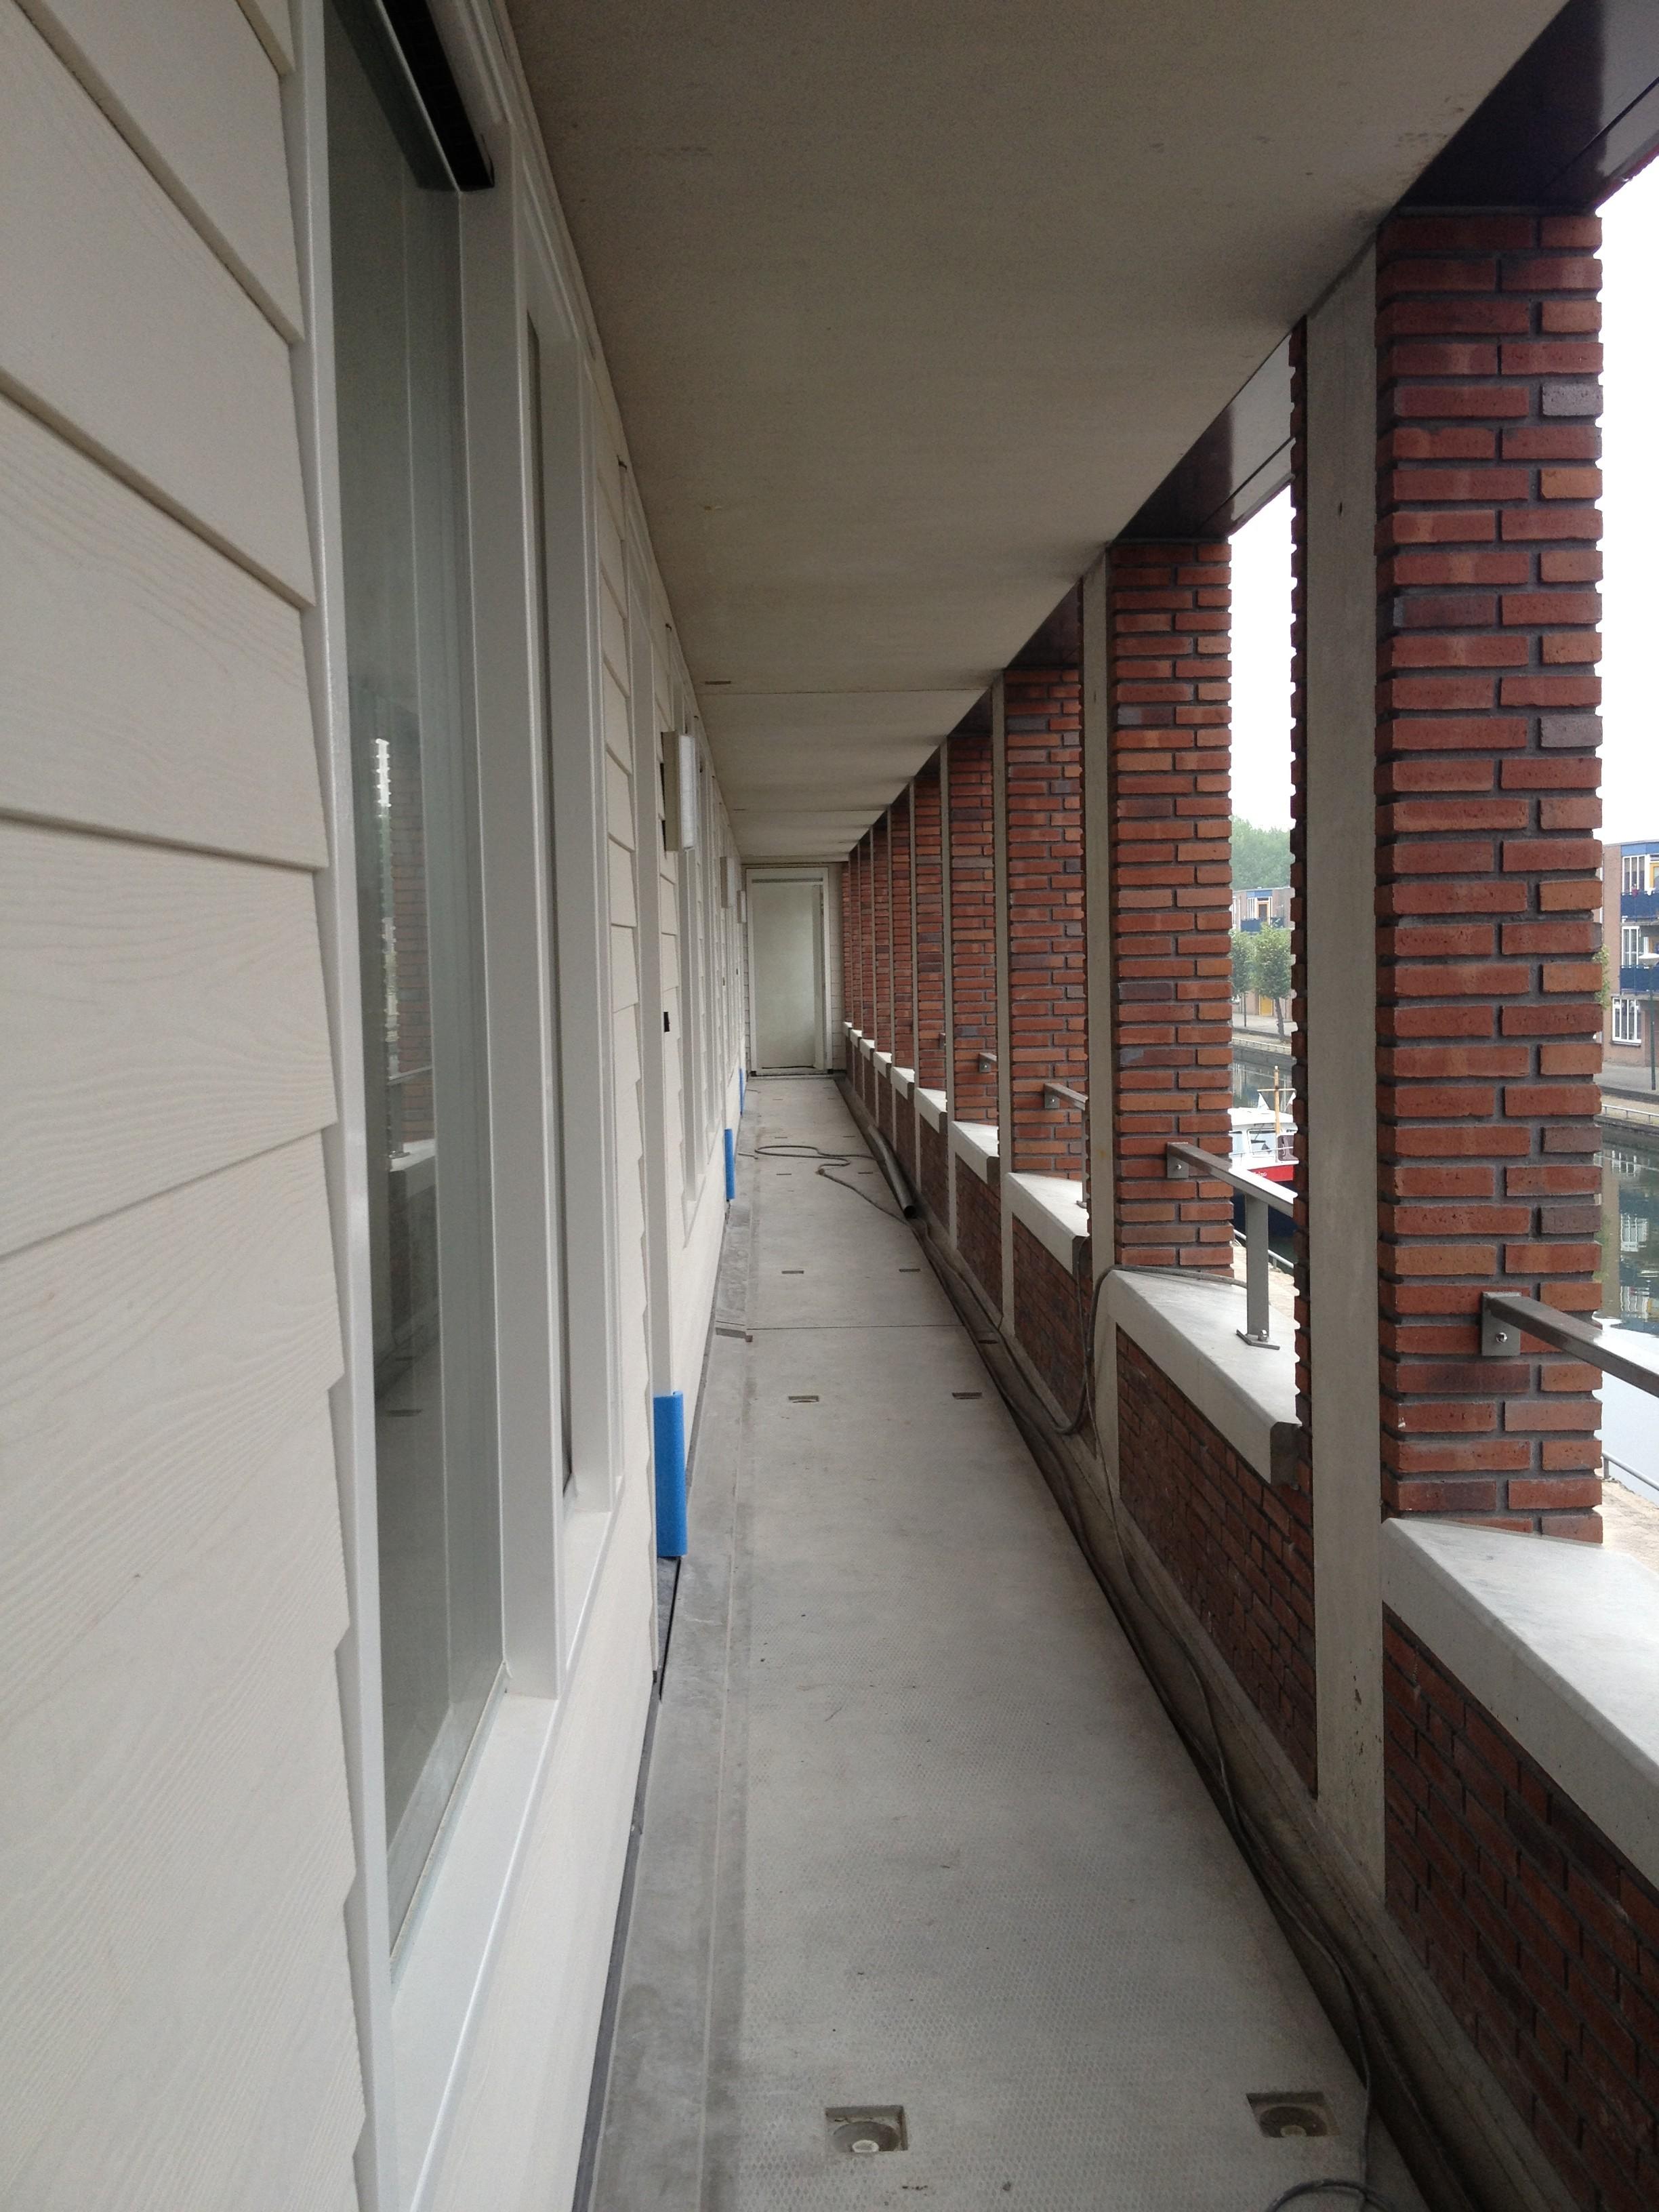 BKT_provides_devriesenverburg_IJsselstein_appartementen_Panoven_parkeerkelder_schuindak_metslwerk_zink_bouwbord_Cubord_Esbi_04.jpg